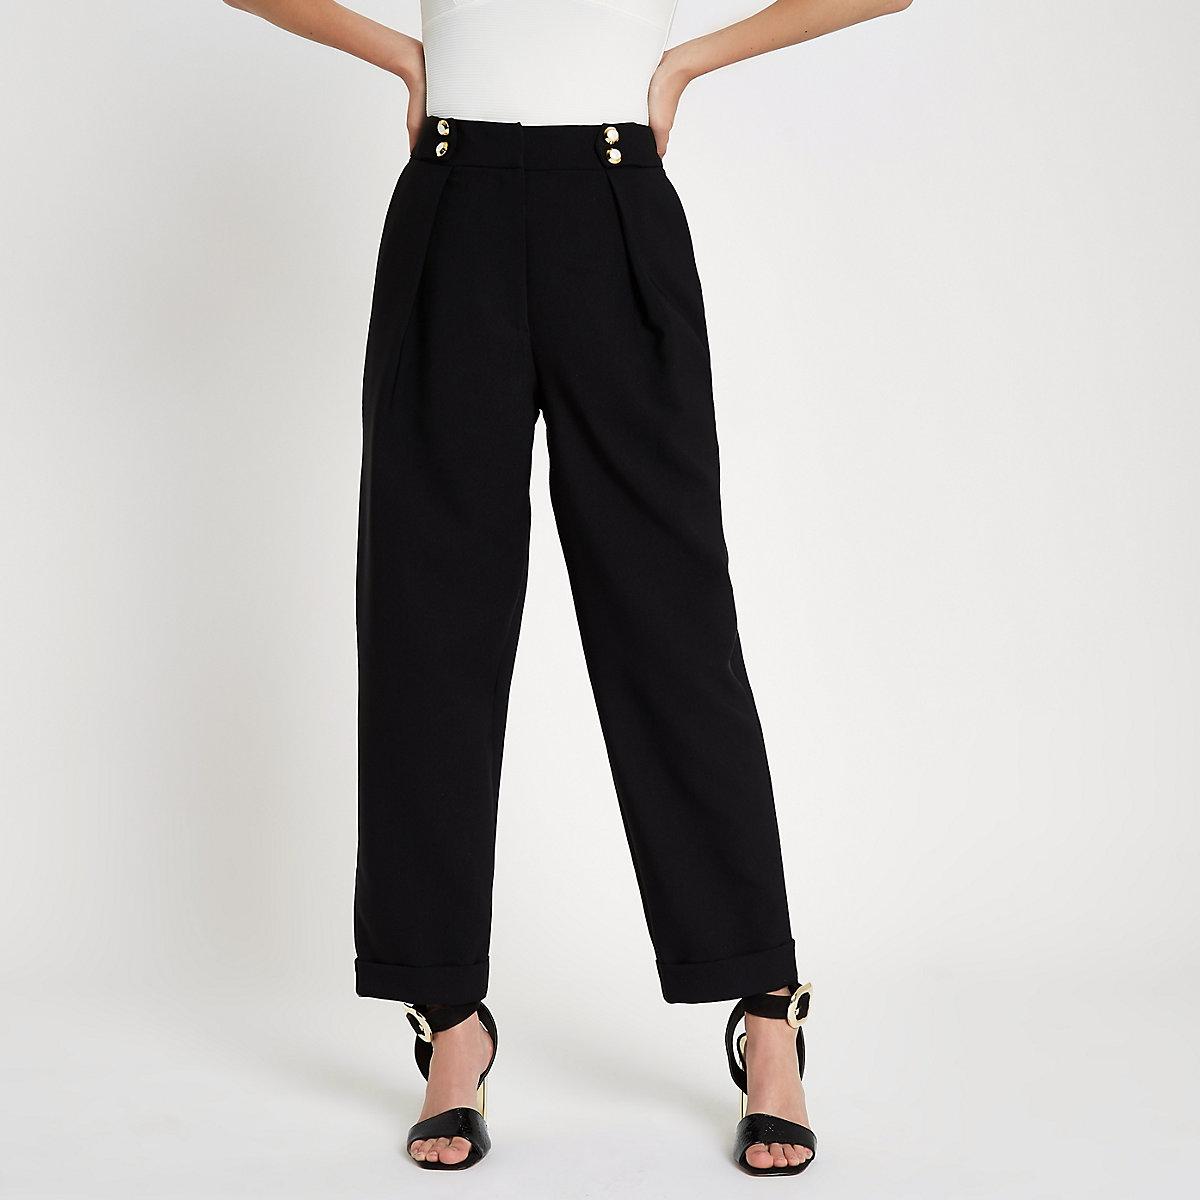 Black button peg pants